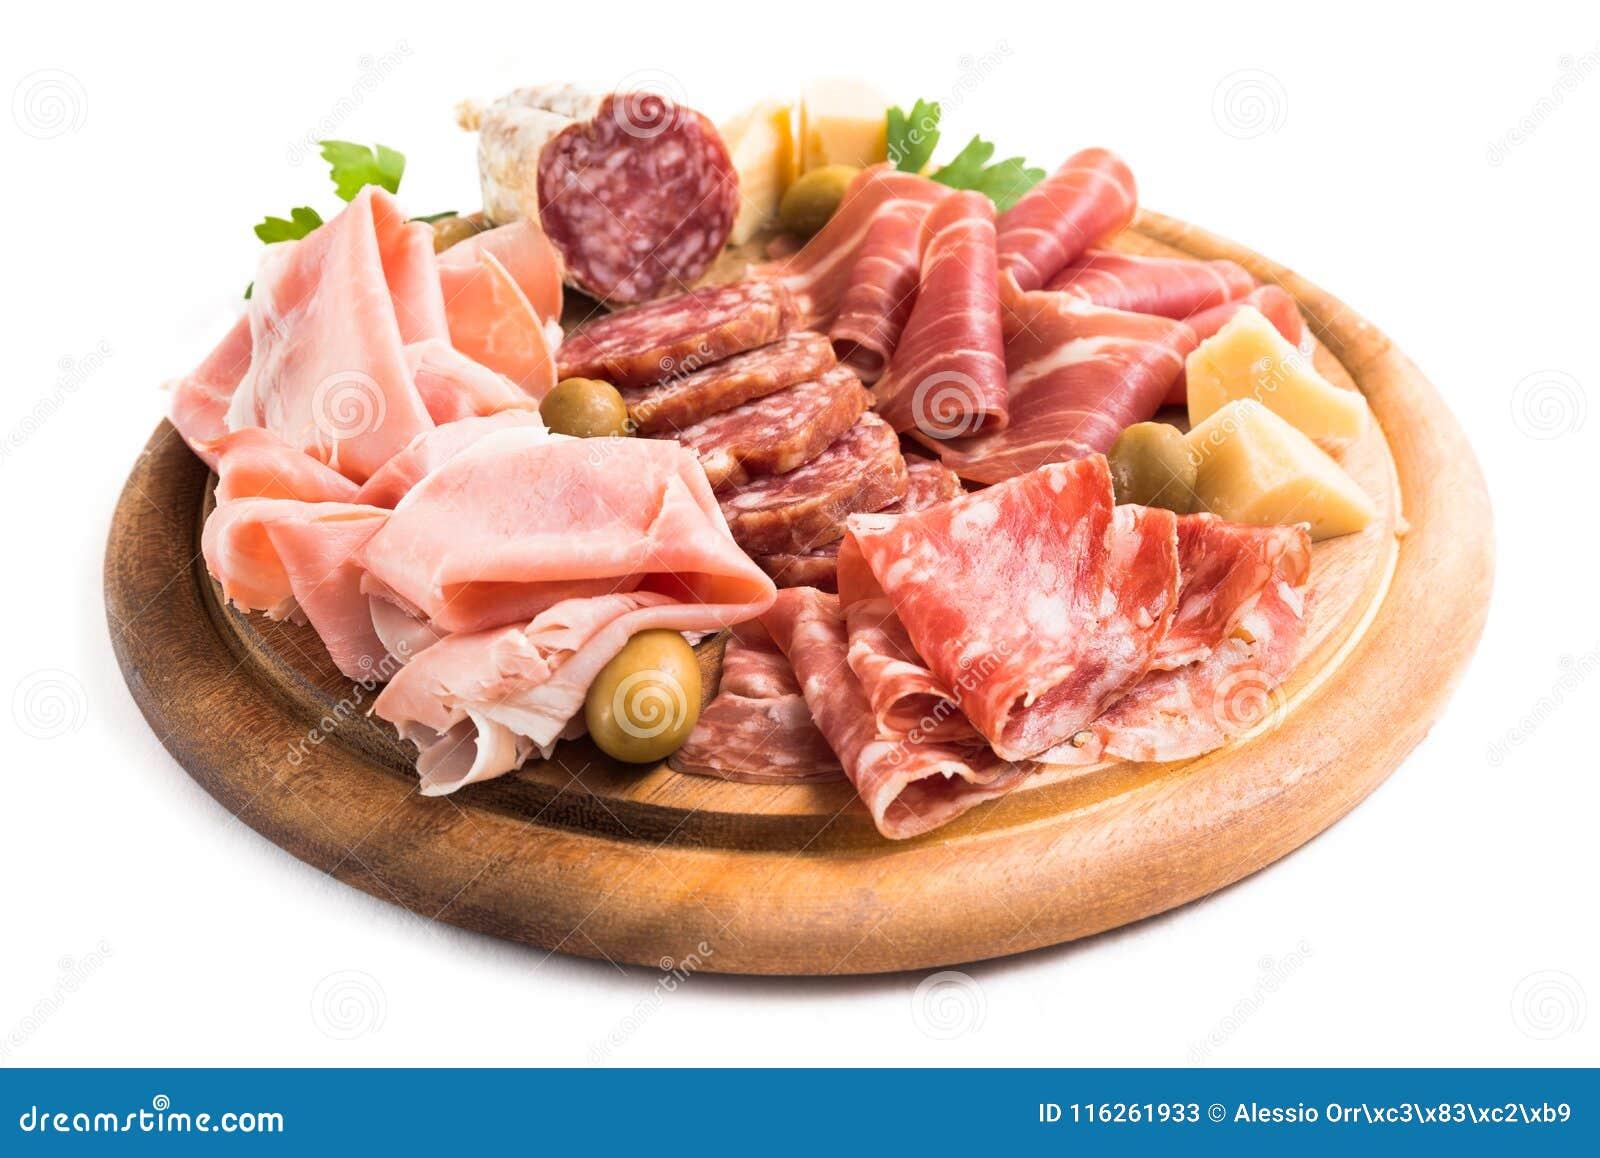 Italian Appetizers Platter Stock Image Image Of Delicatessen 116261933